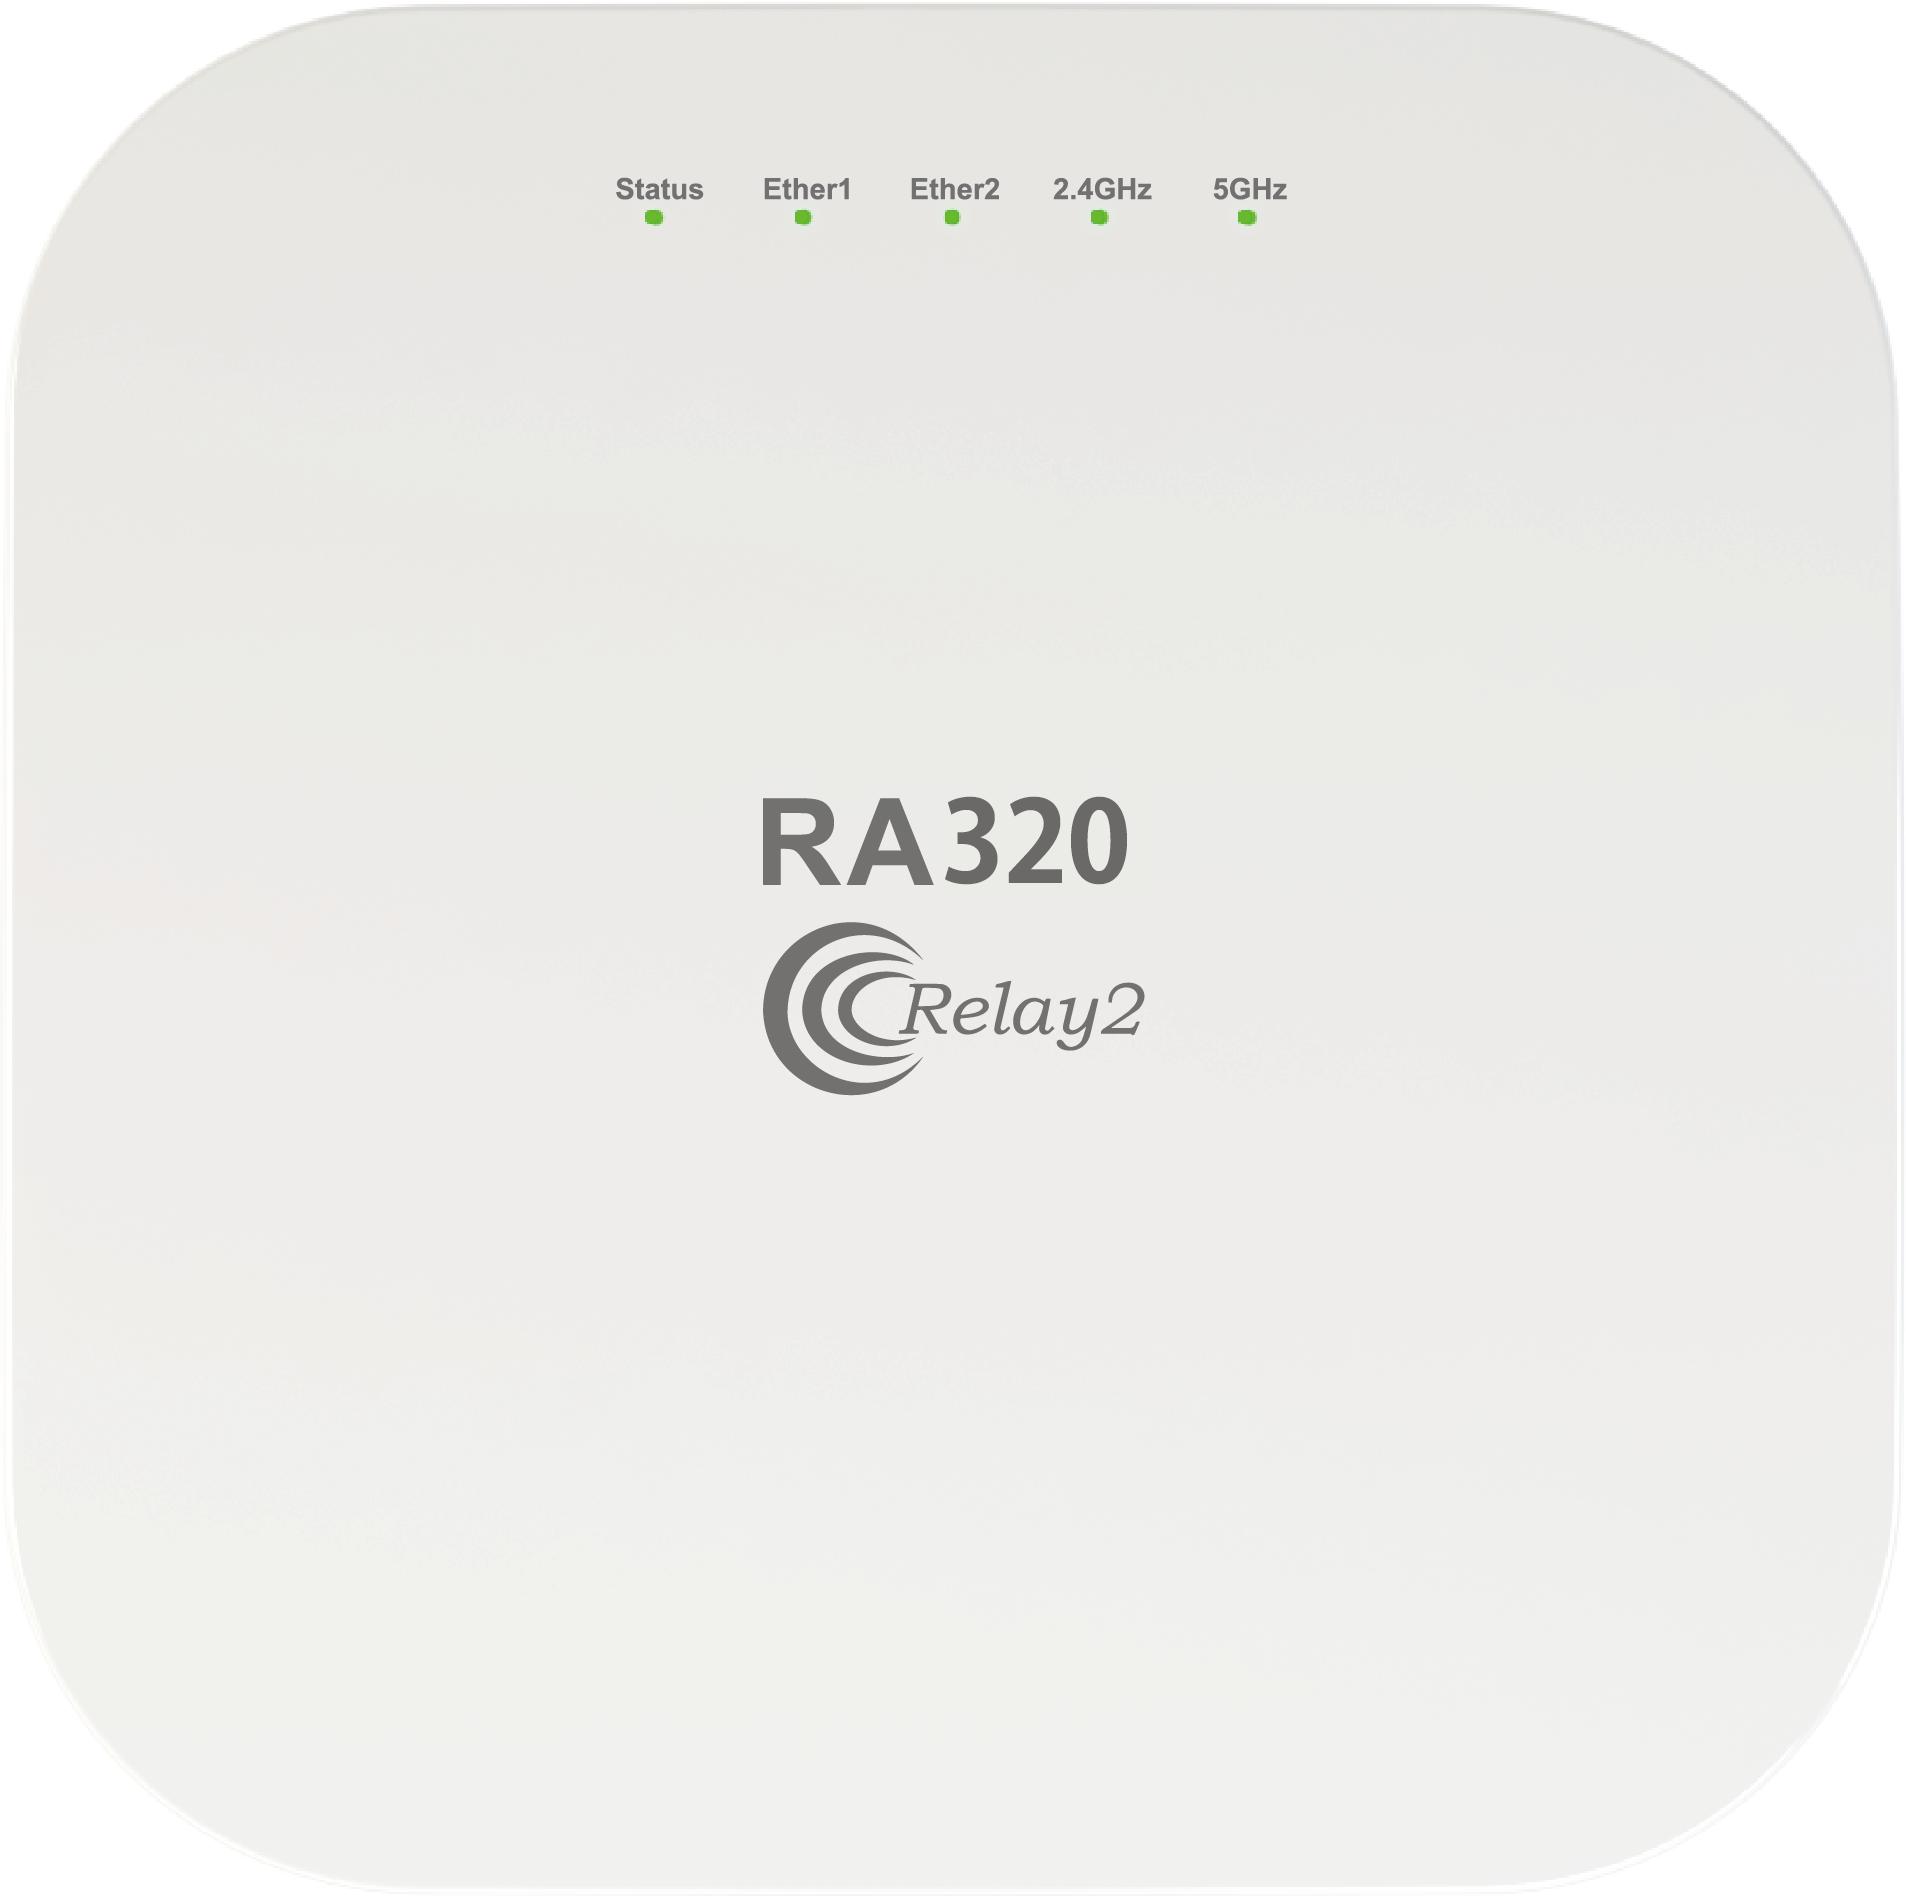 ra320